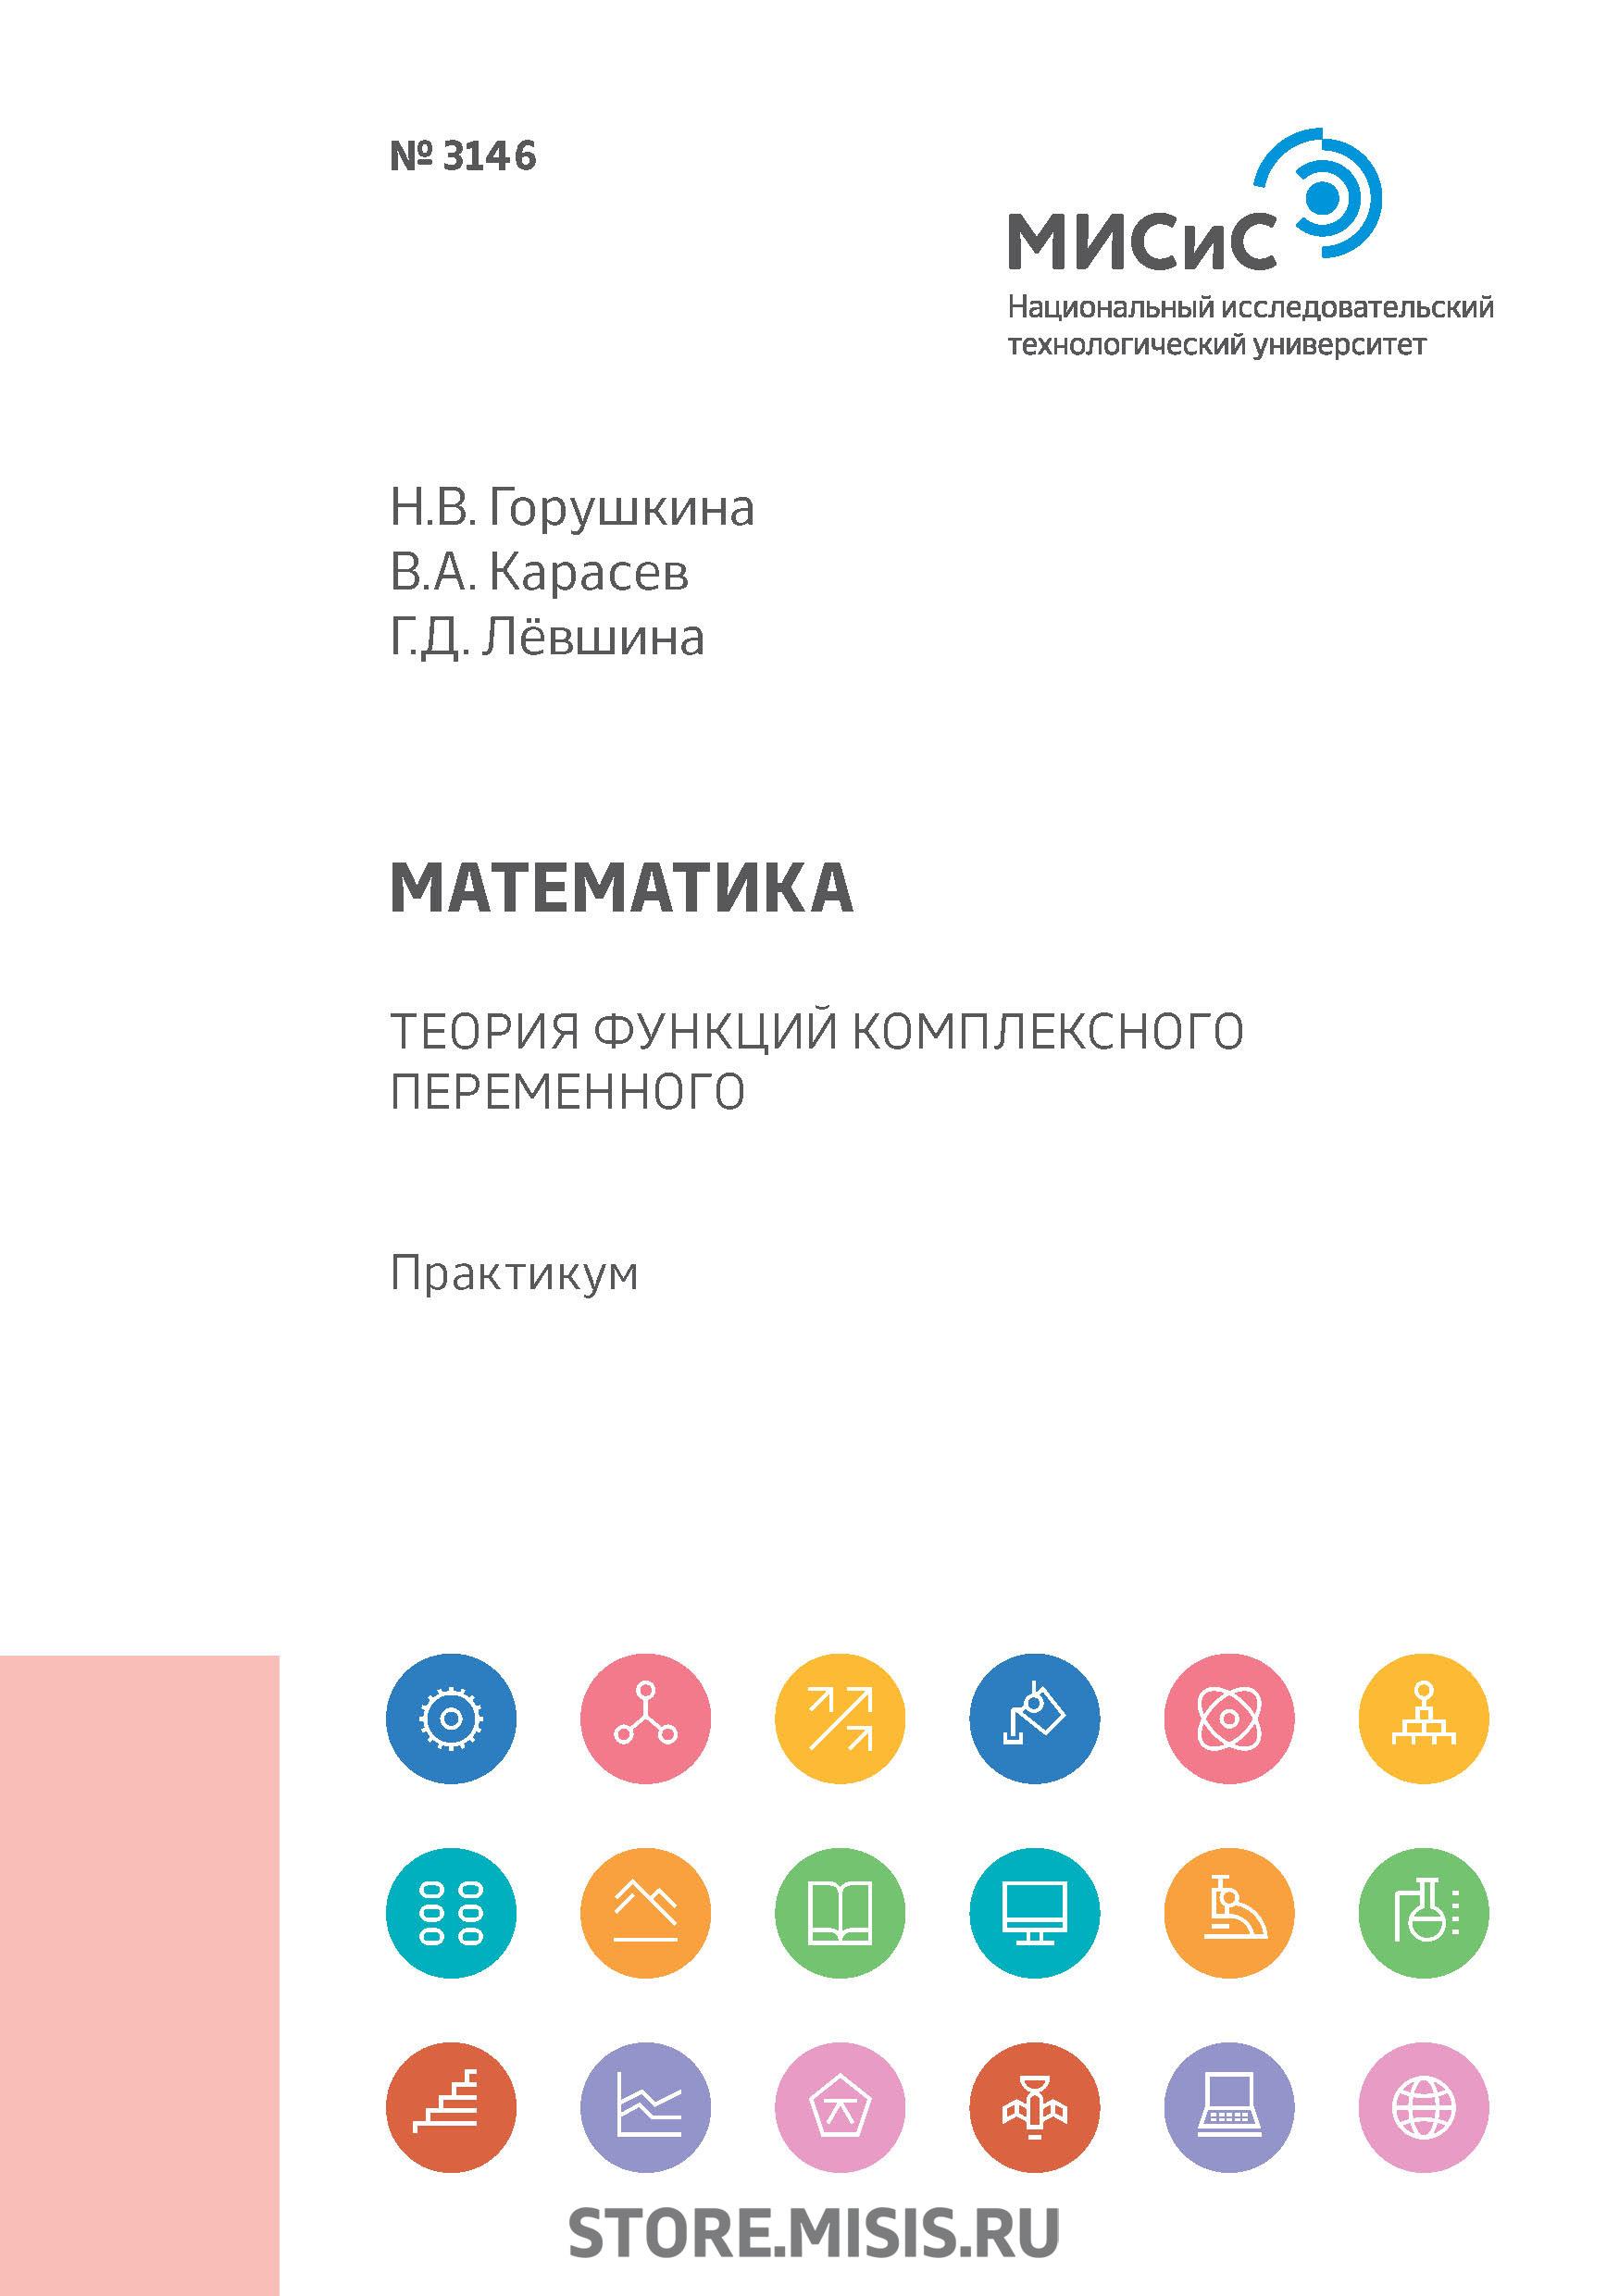 В. А. Карасев Математика. Теория функций комплексного переменного. Практикум цена